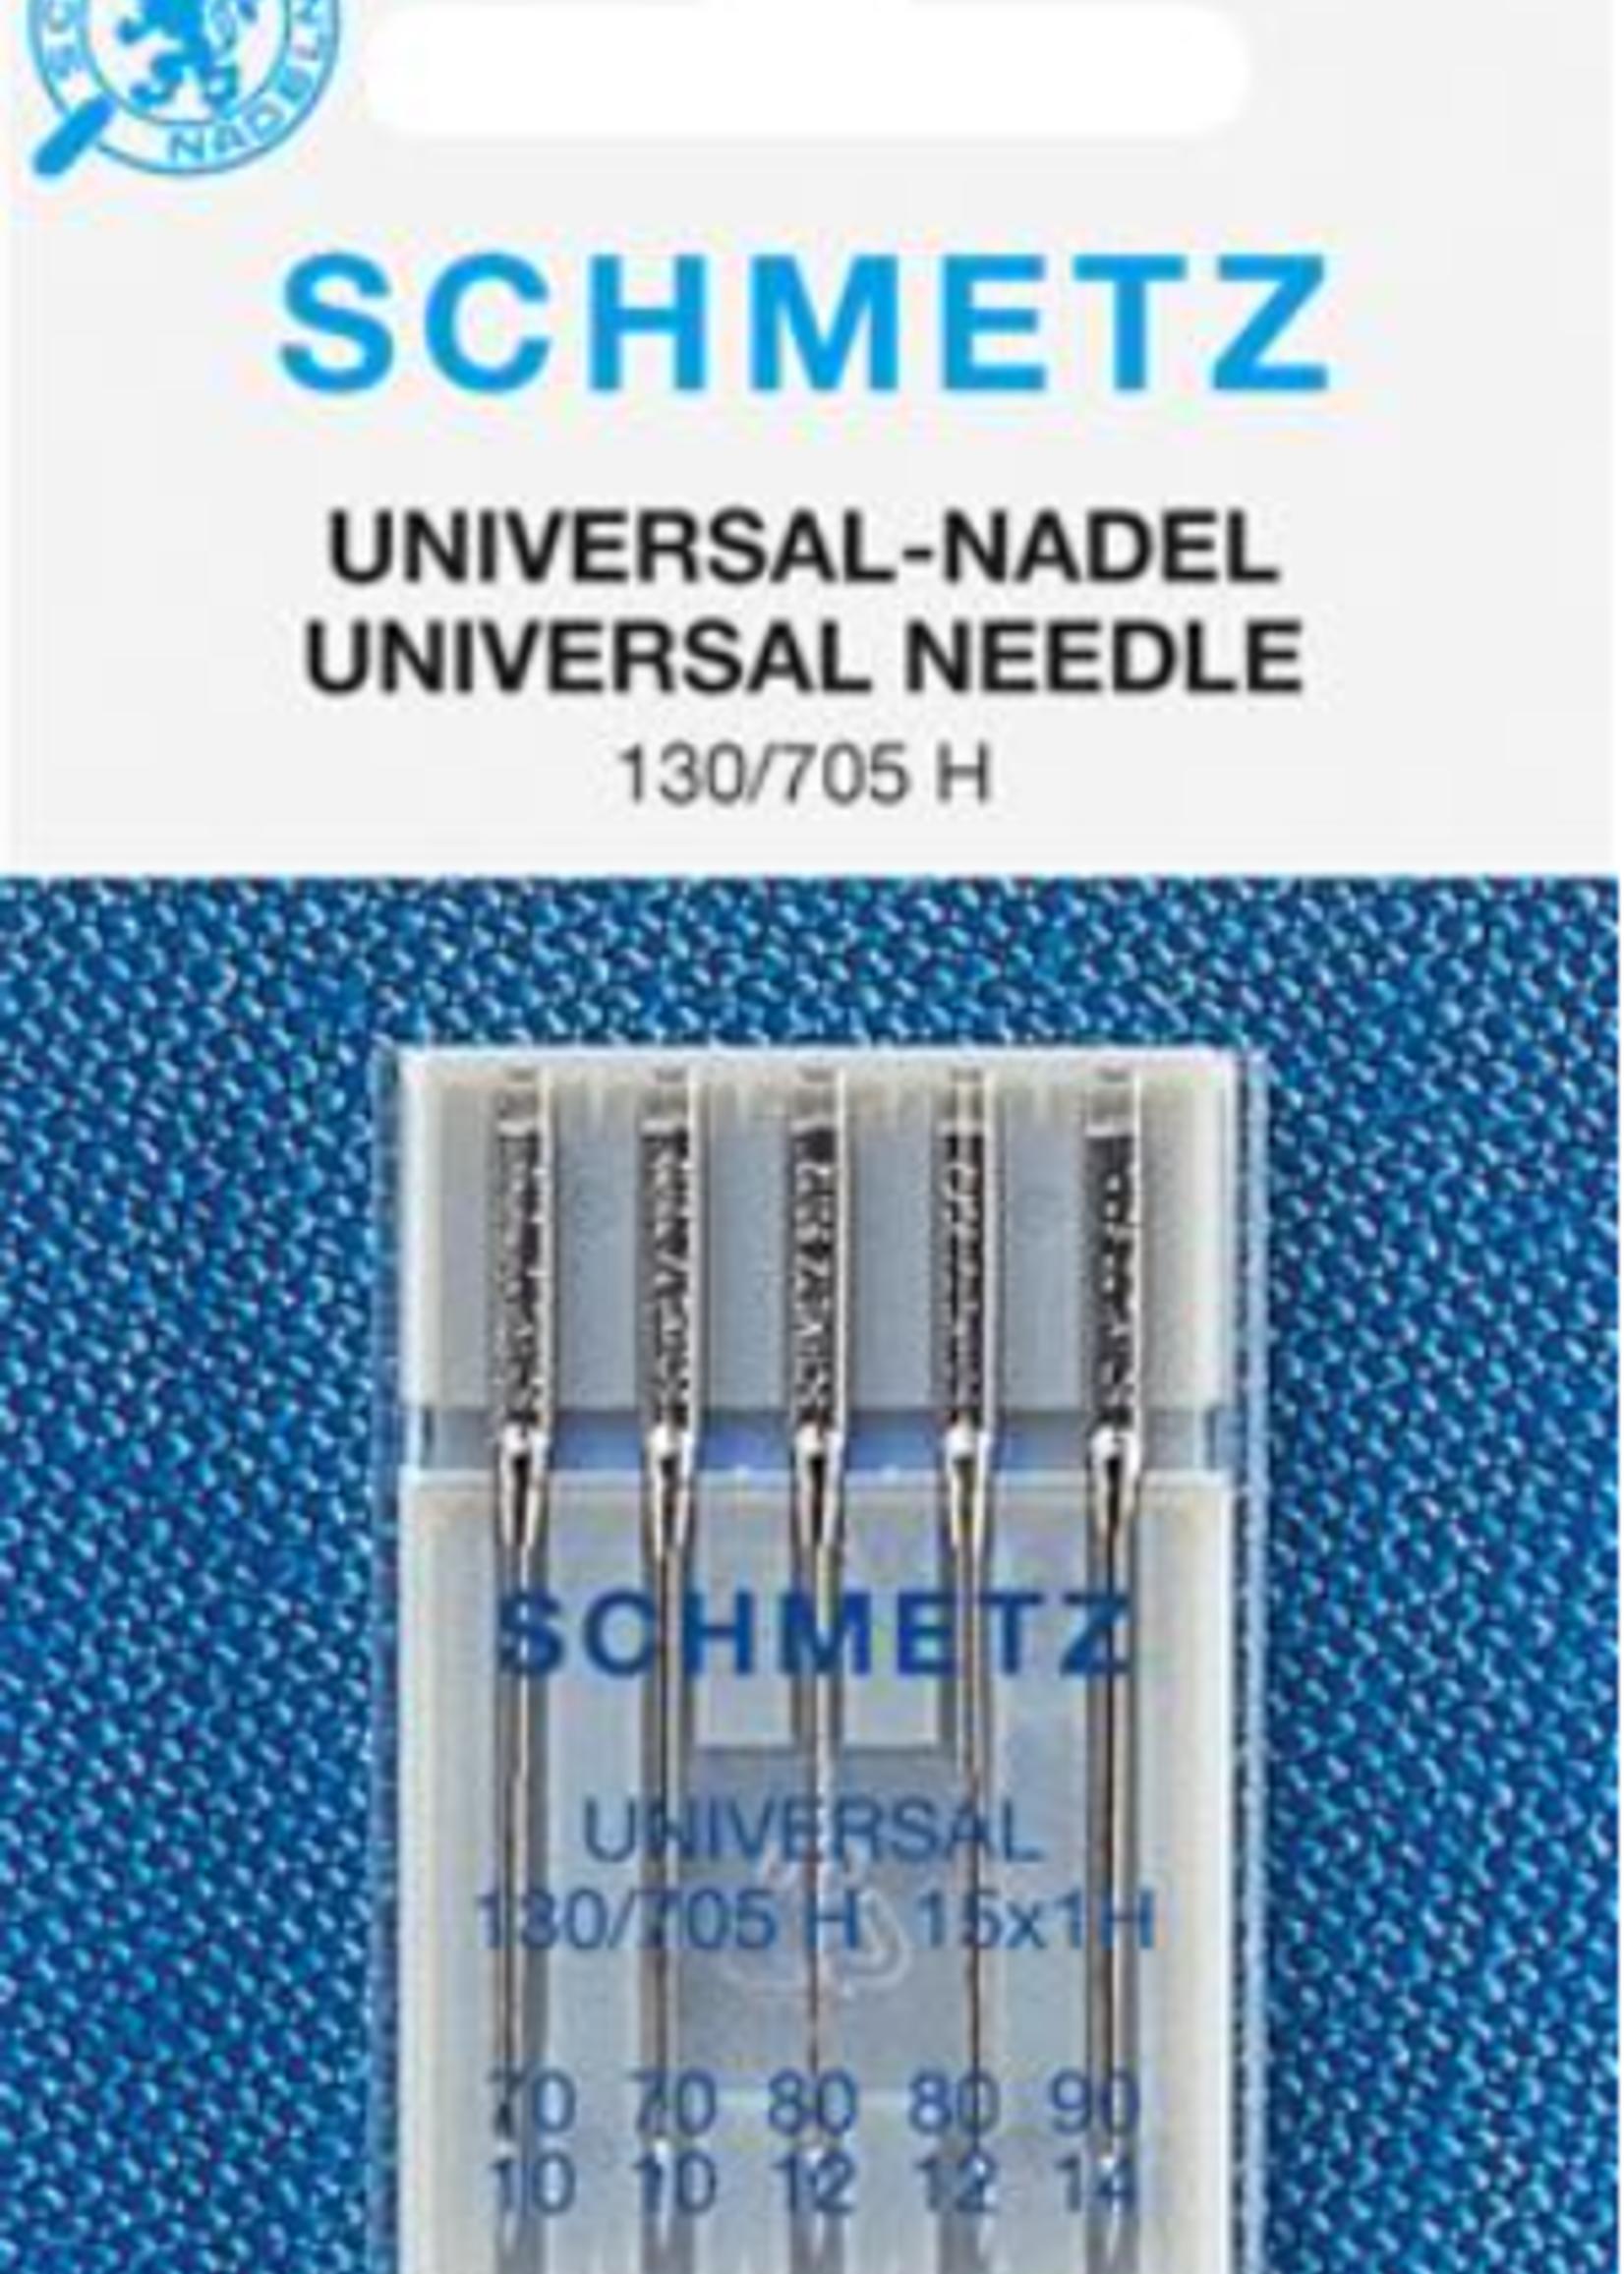 Schmetz Machinenaald Assort Universal H n70-90